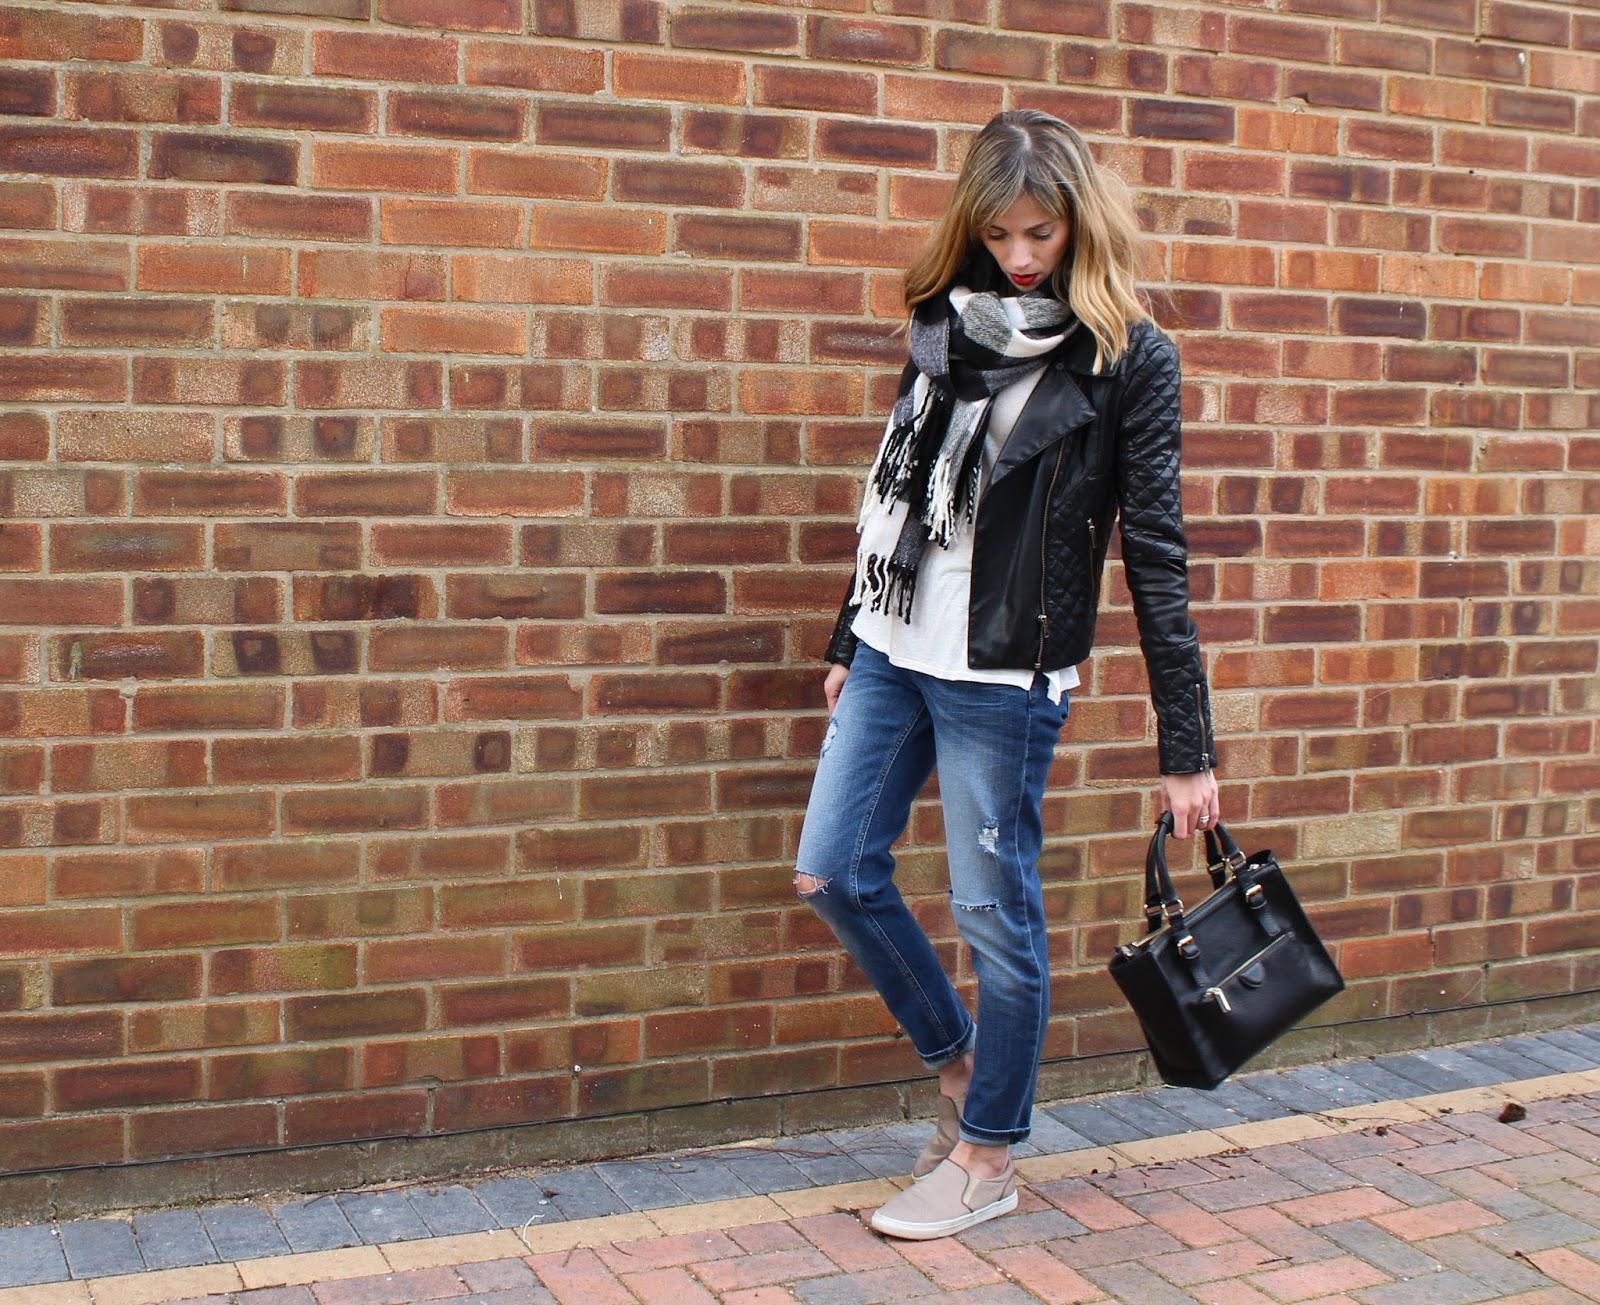 OOTD - H&M Girlfriend Jeans, Casual